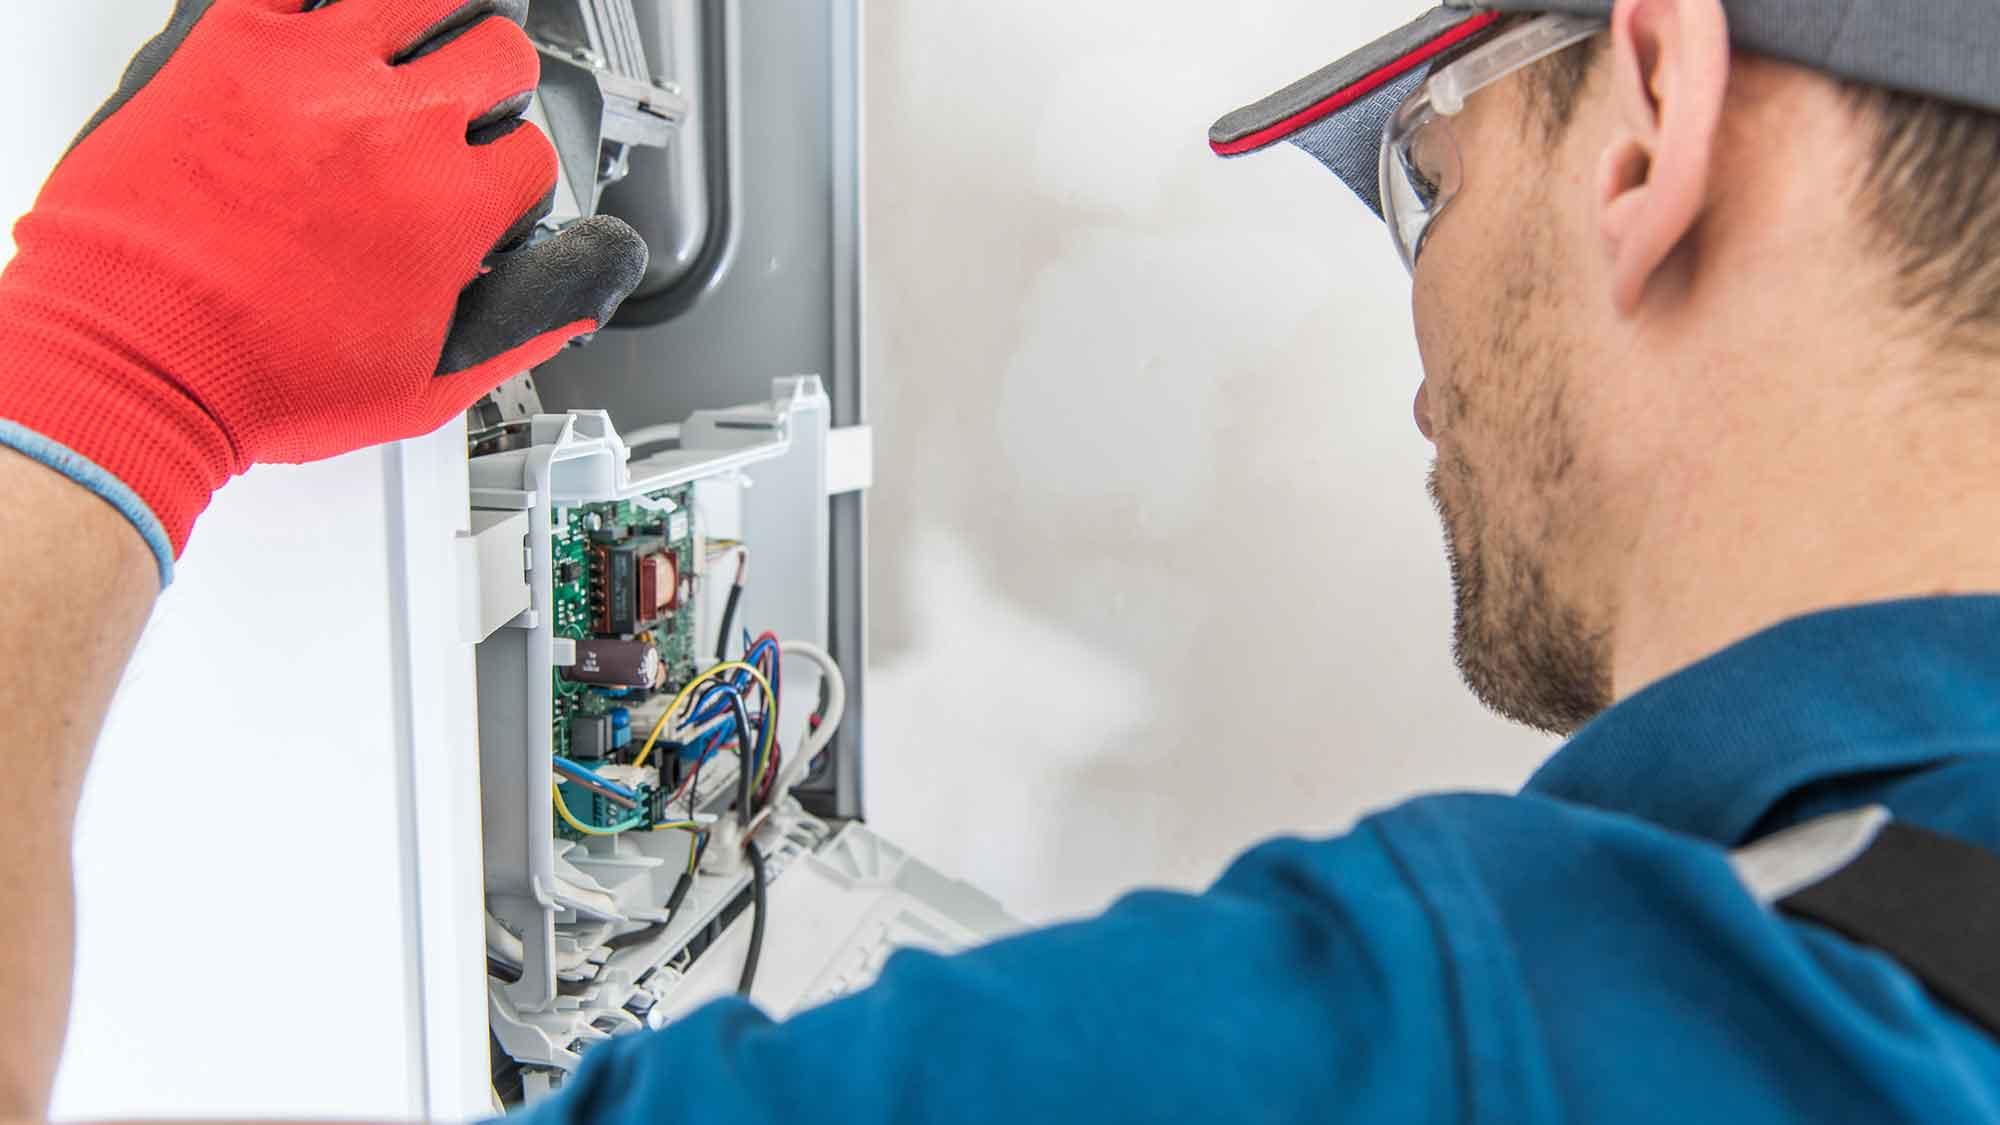 boiler installation essex maintenance leigh on sea engineer